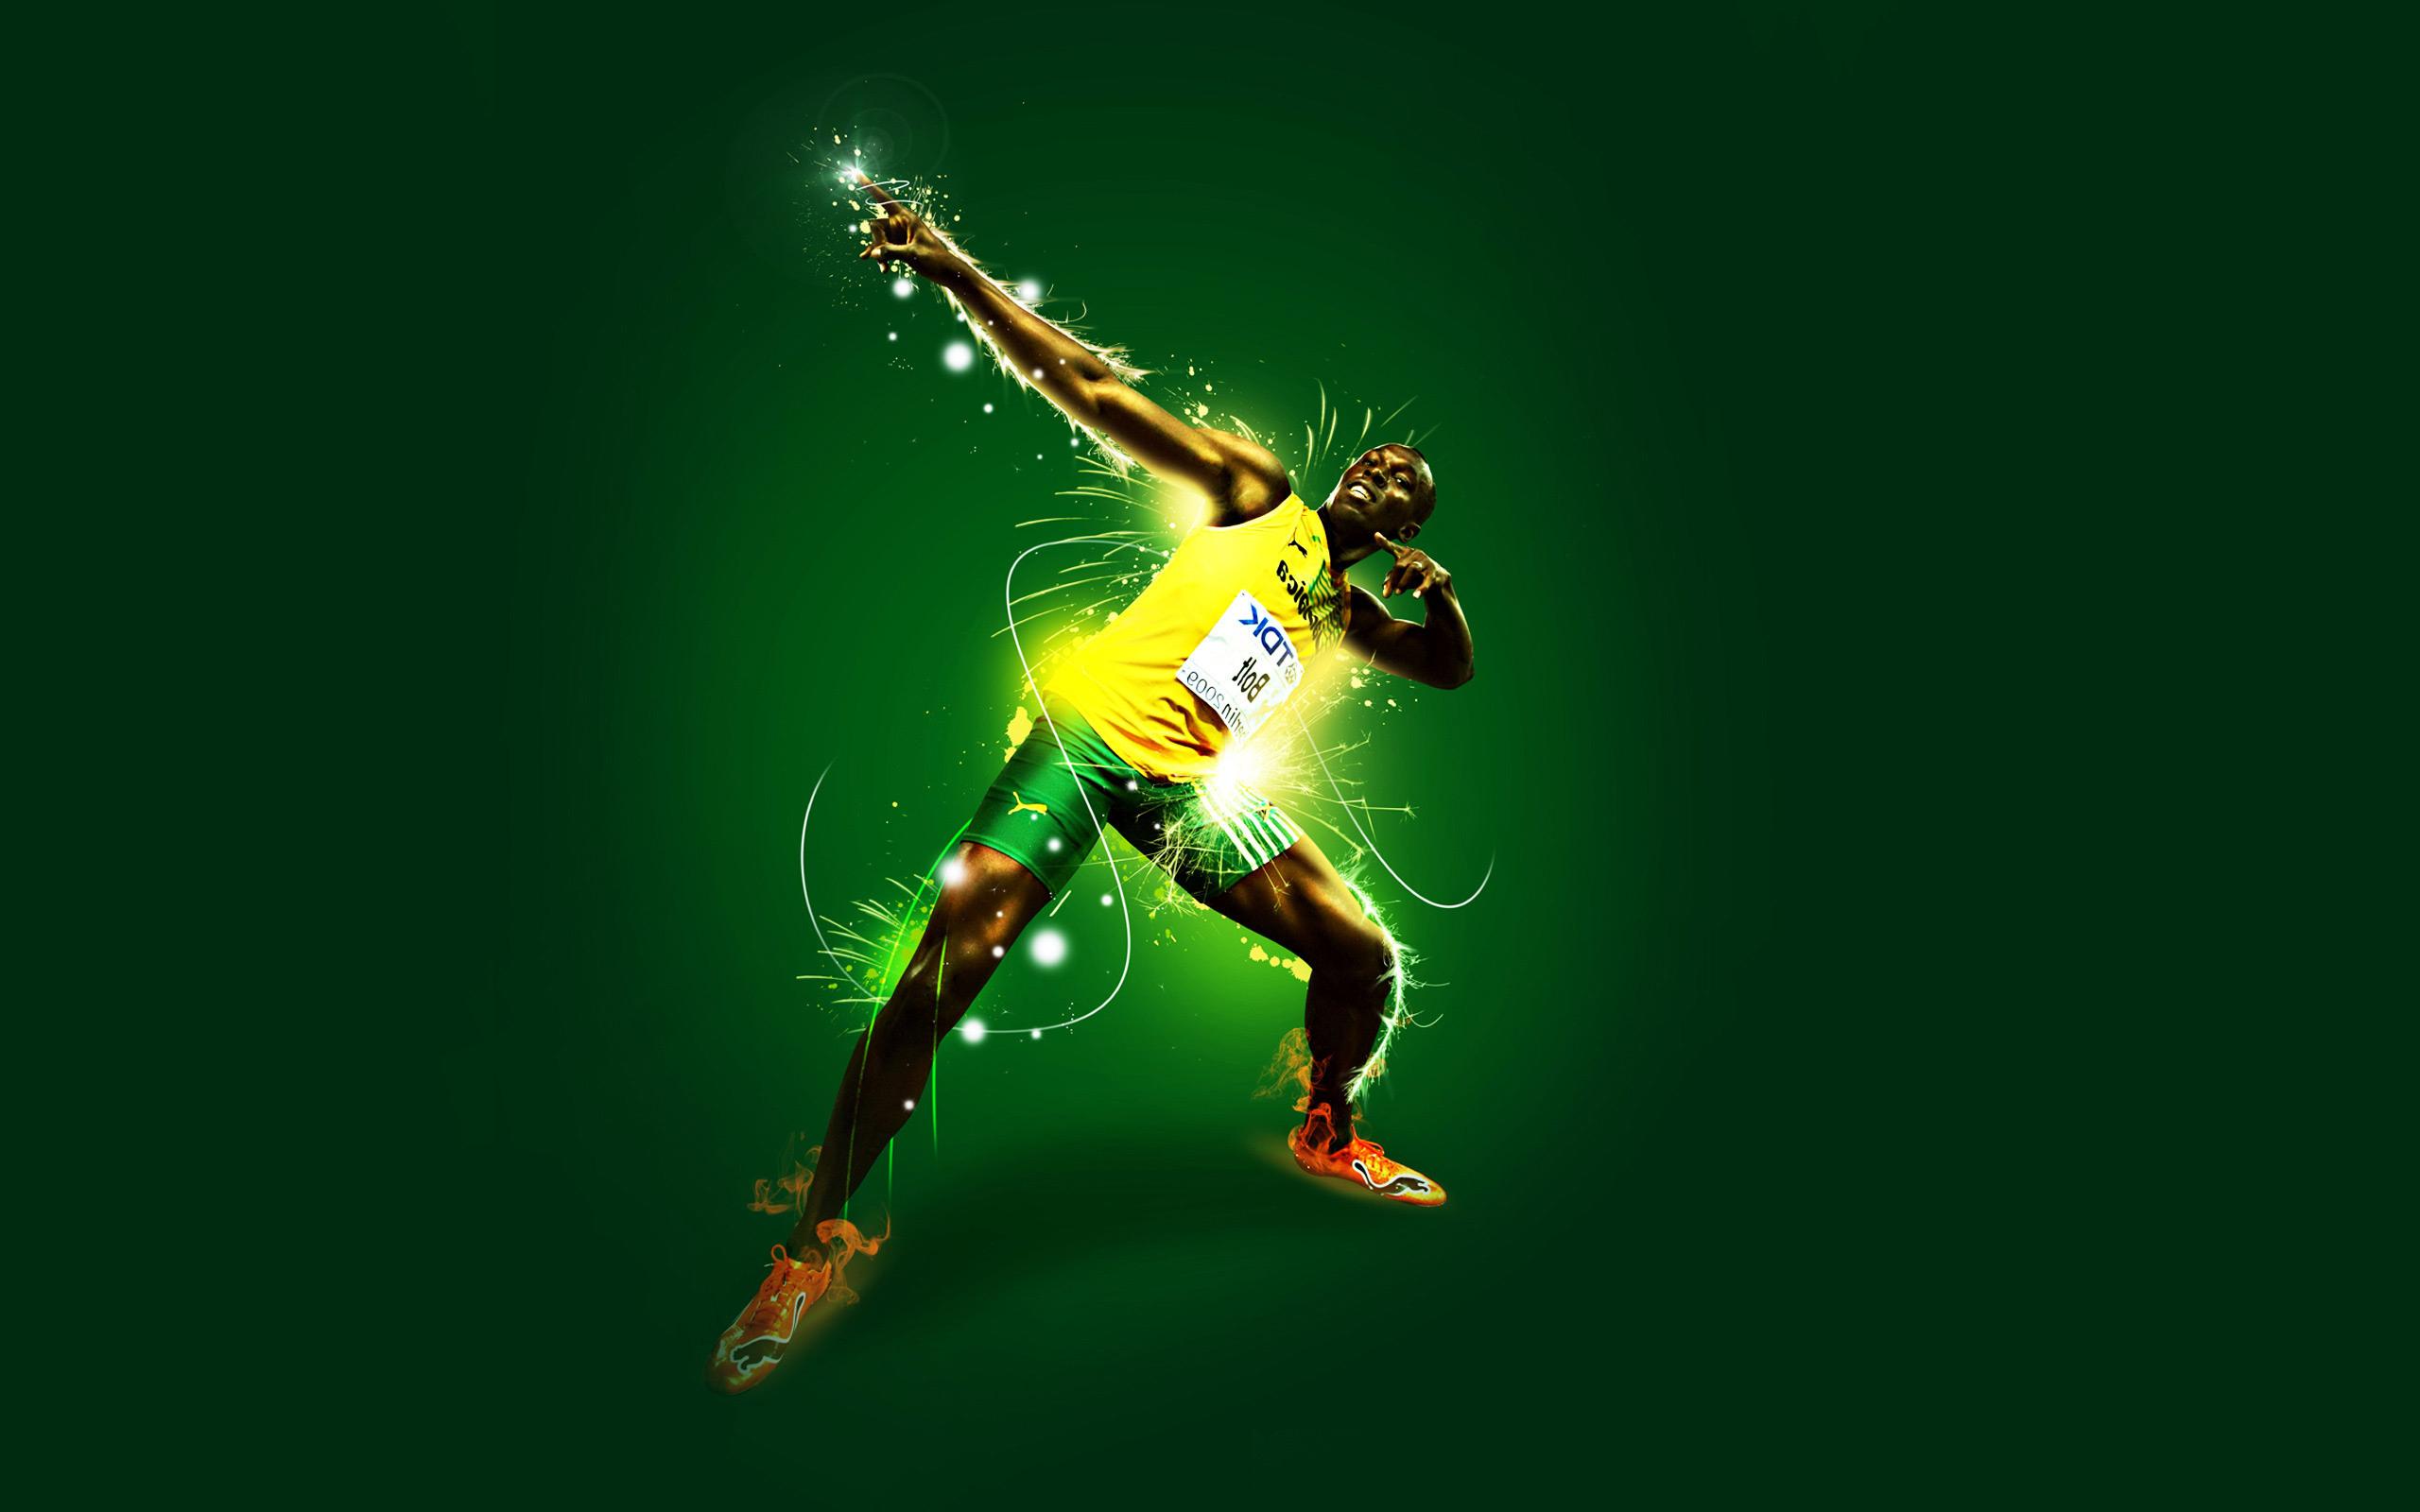 Usain Bolt Wallpaper Welcome to jahjastarz 2560x1600